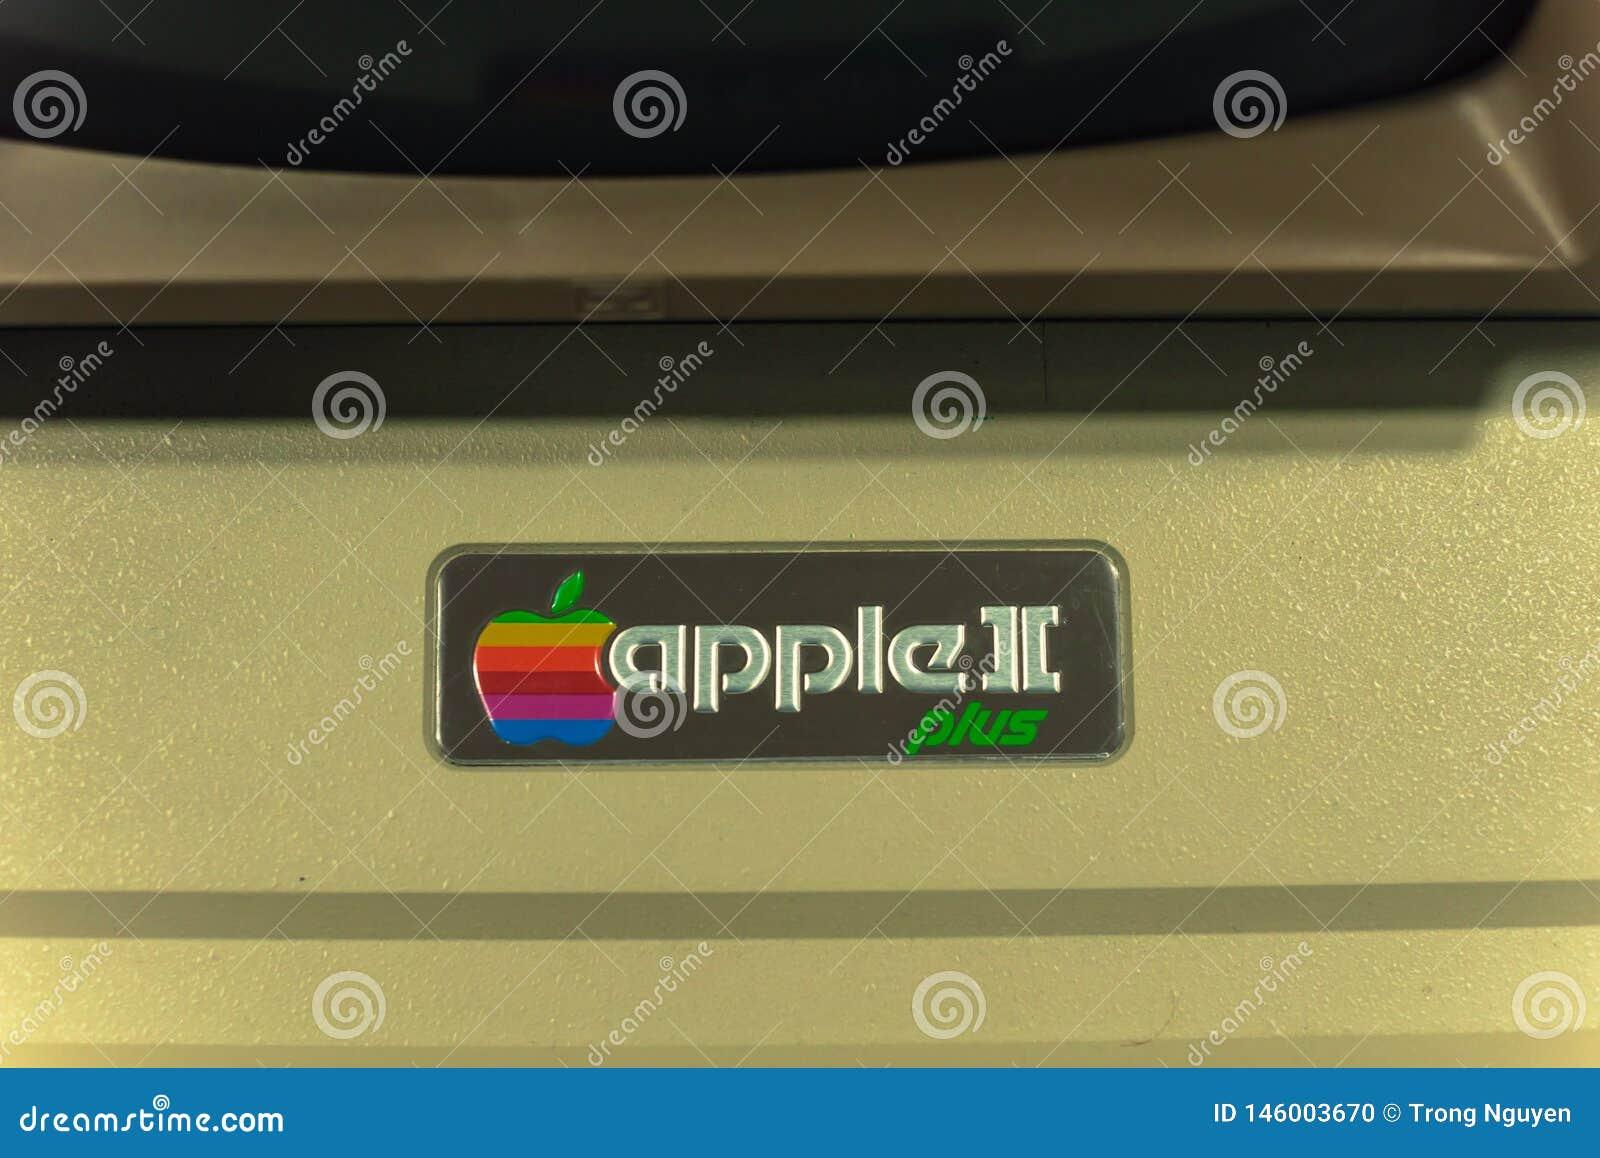 Filtered image close-up logo of old Apple II computer